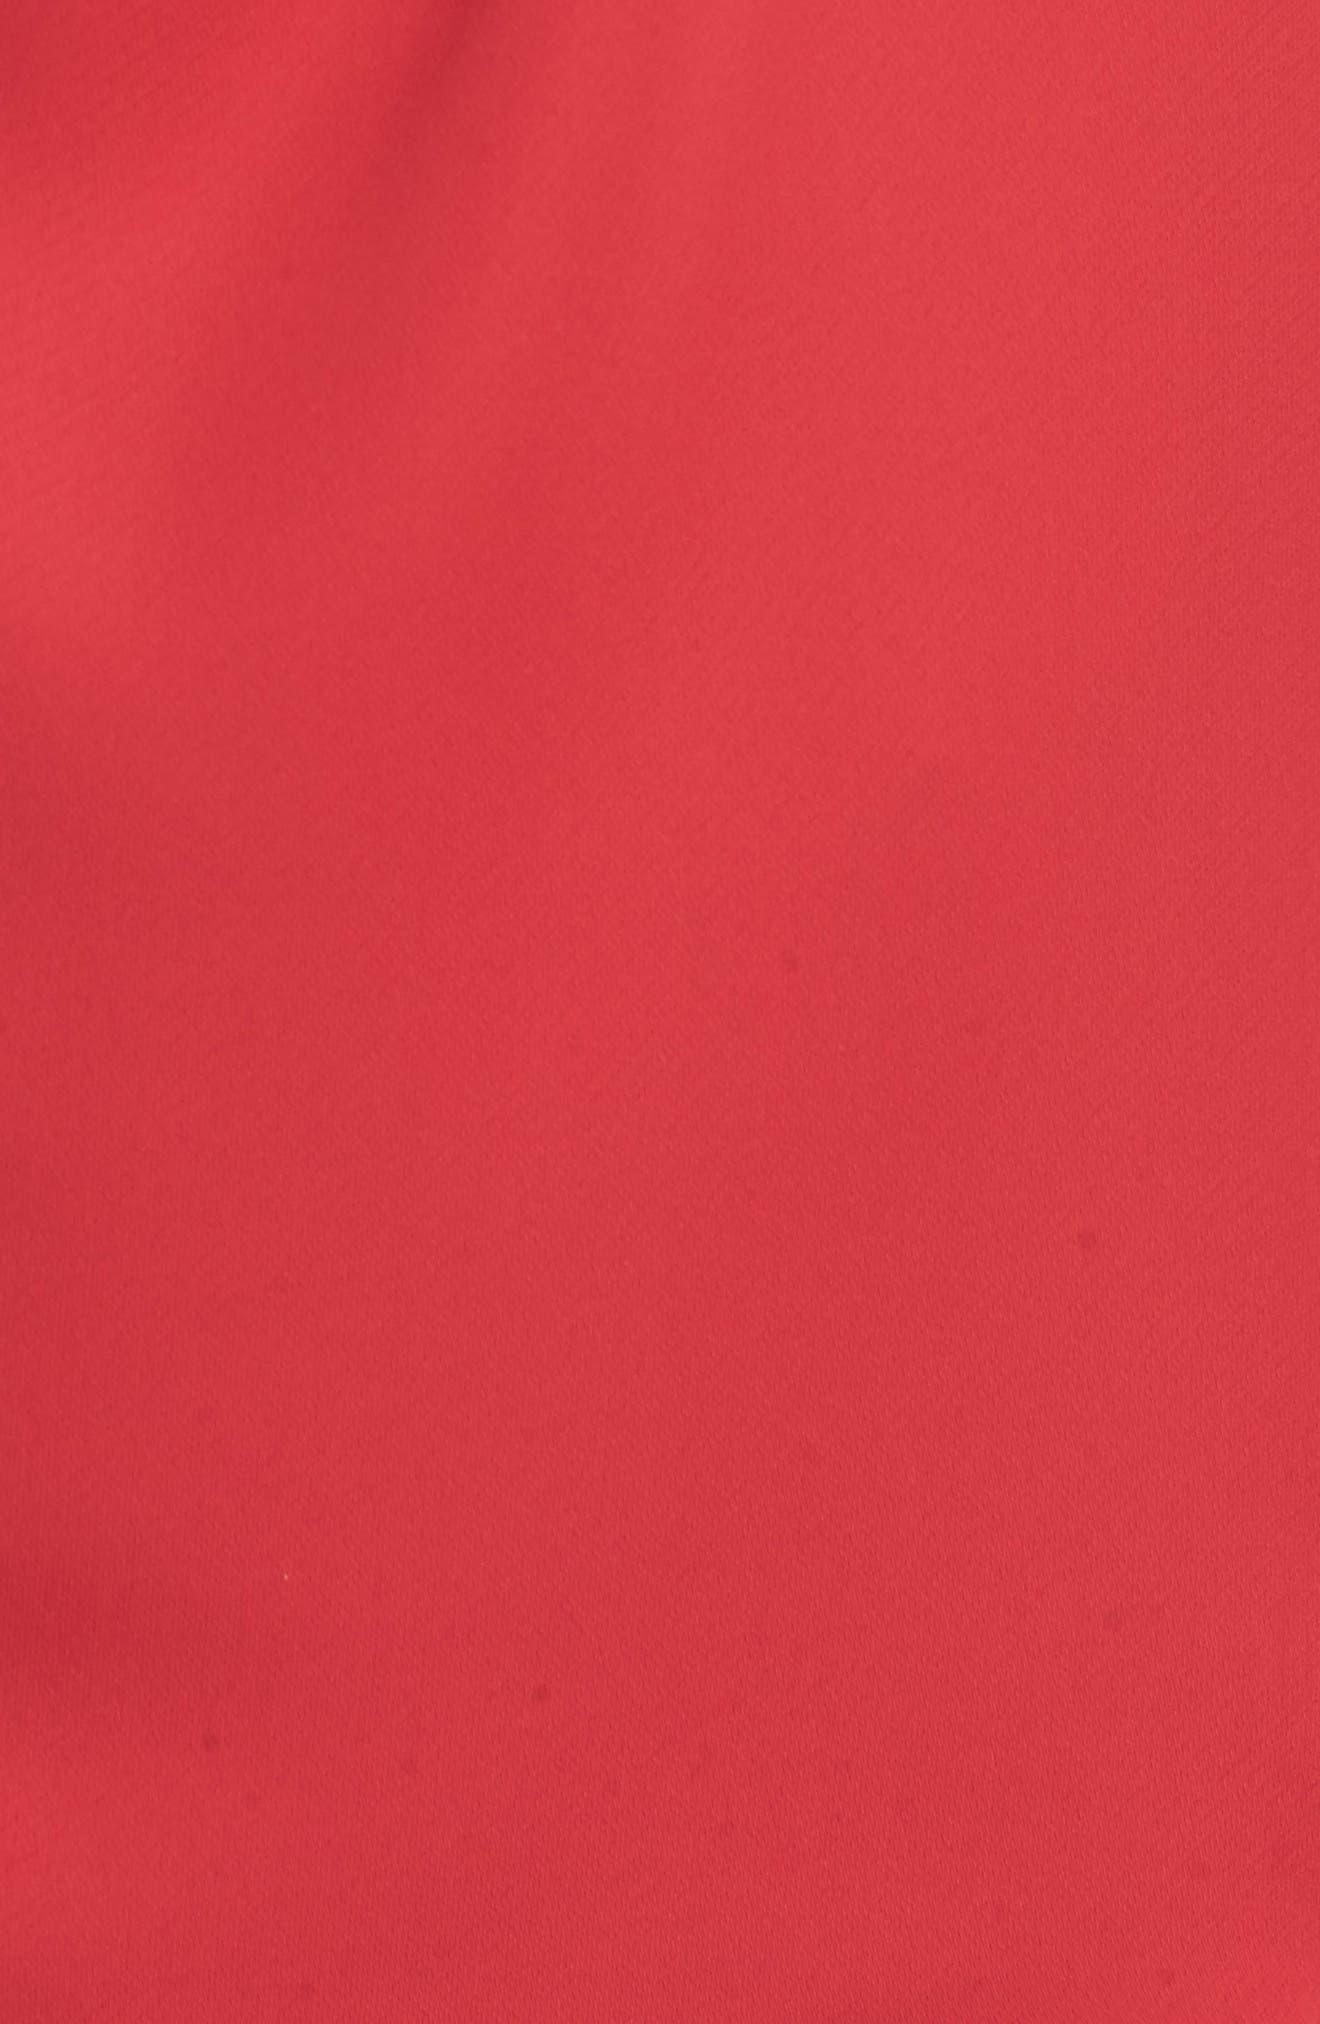 Twist Cap Sleeve Top,                             Alternate thumbnail 5, color,                             True Red